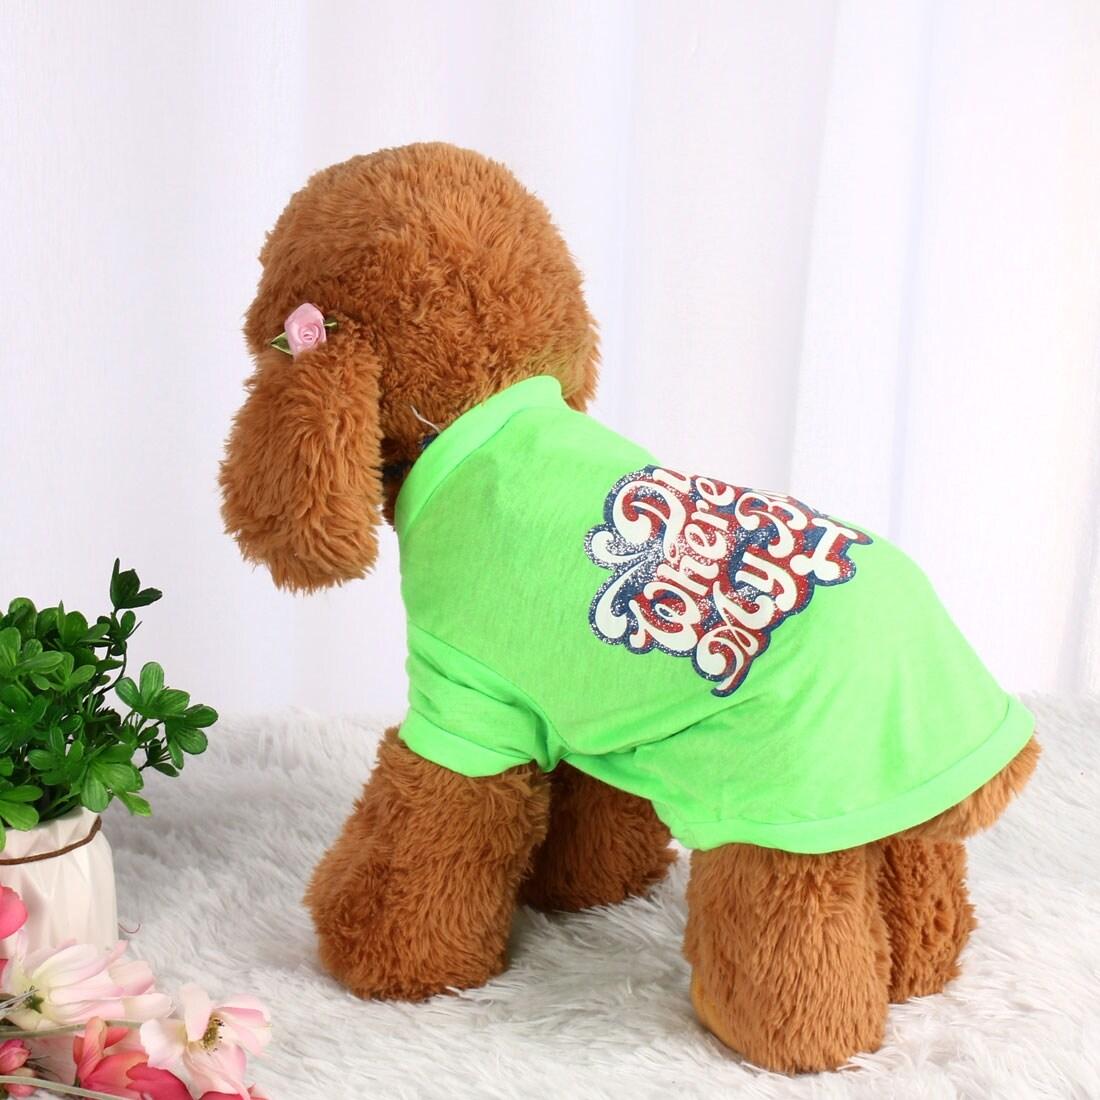 Dog T Shirt Puppy Small Pet Cat Sweatshirt Tops Clothes Apparel Vest Costume (Blue - M)